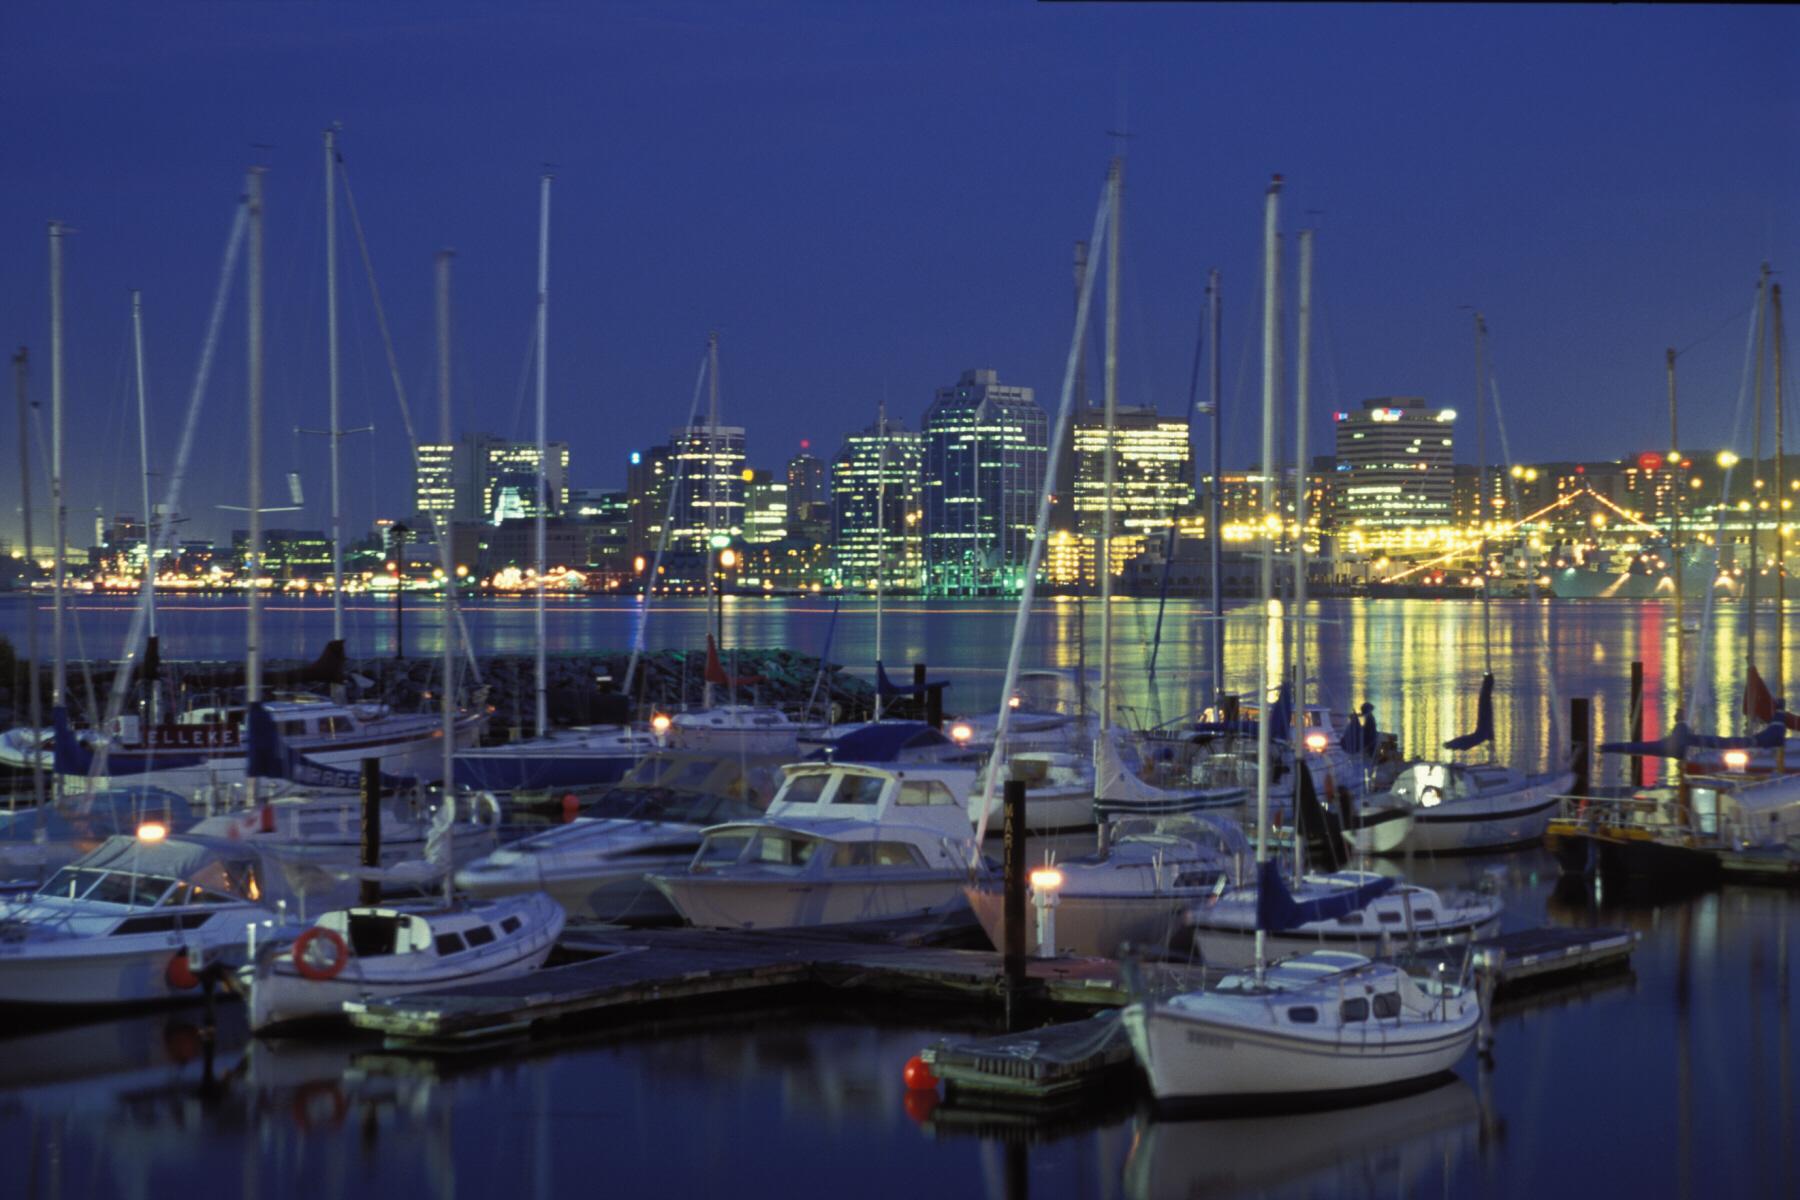 Halifax, the provincial capital